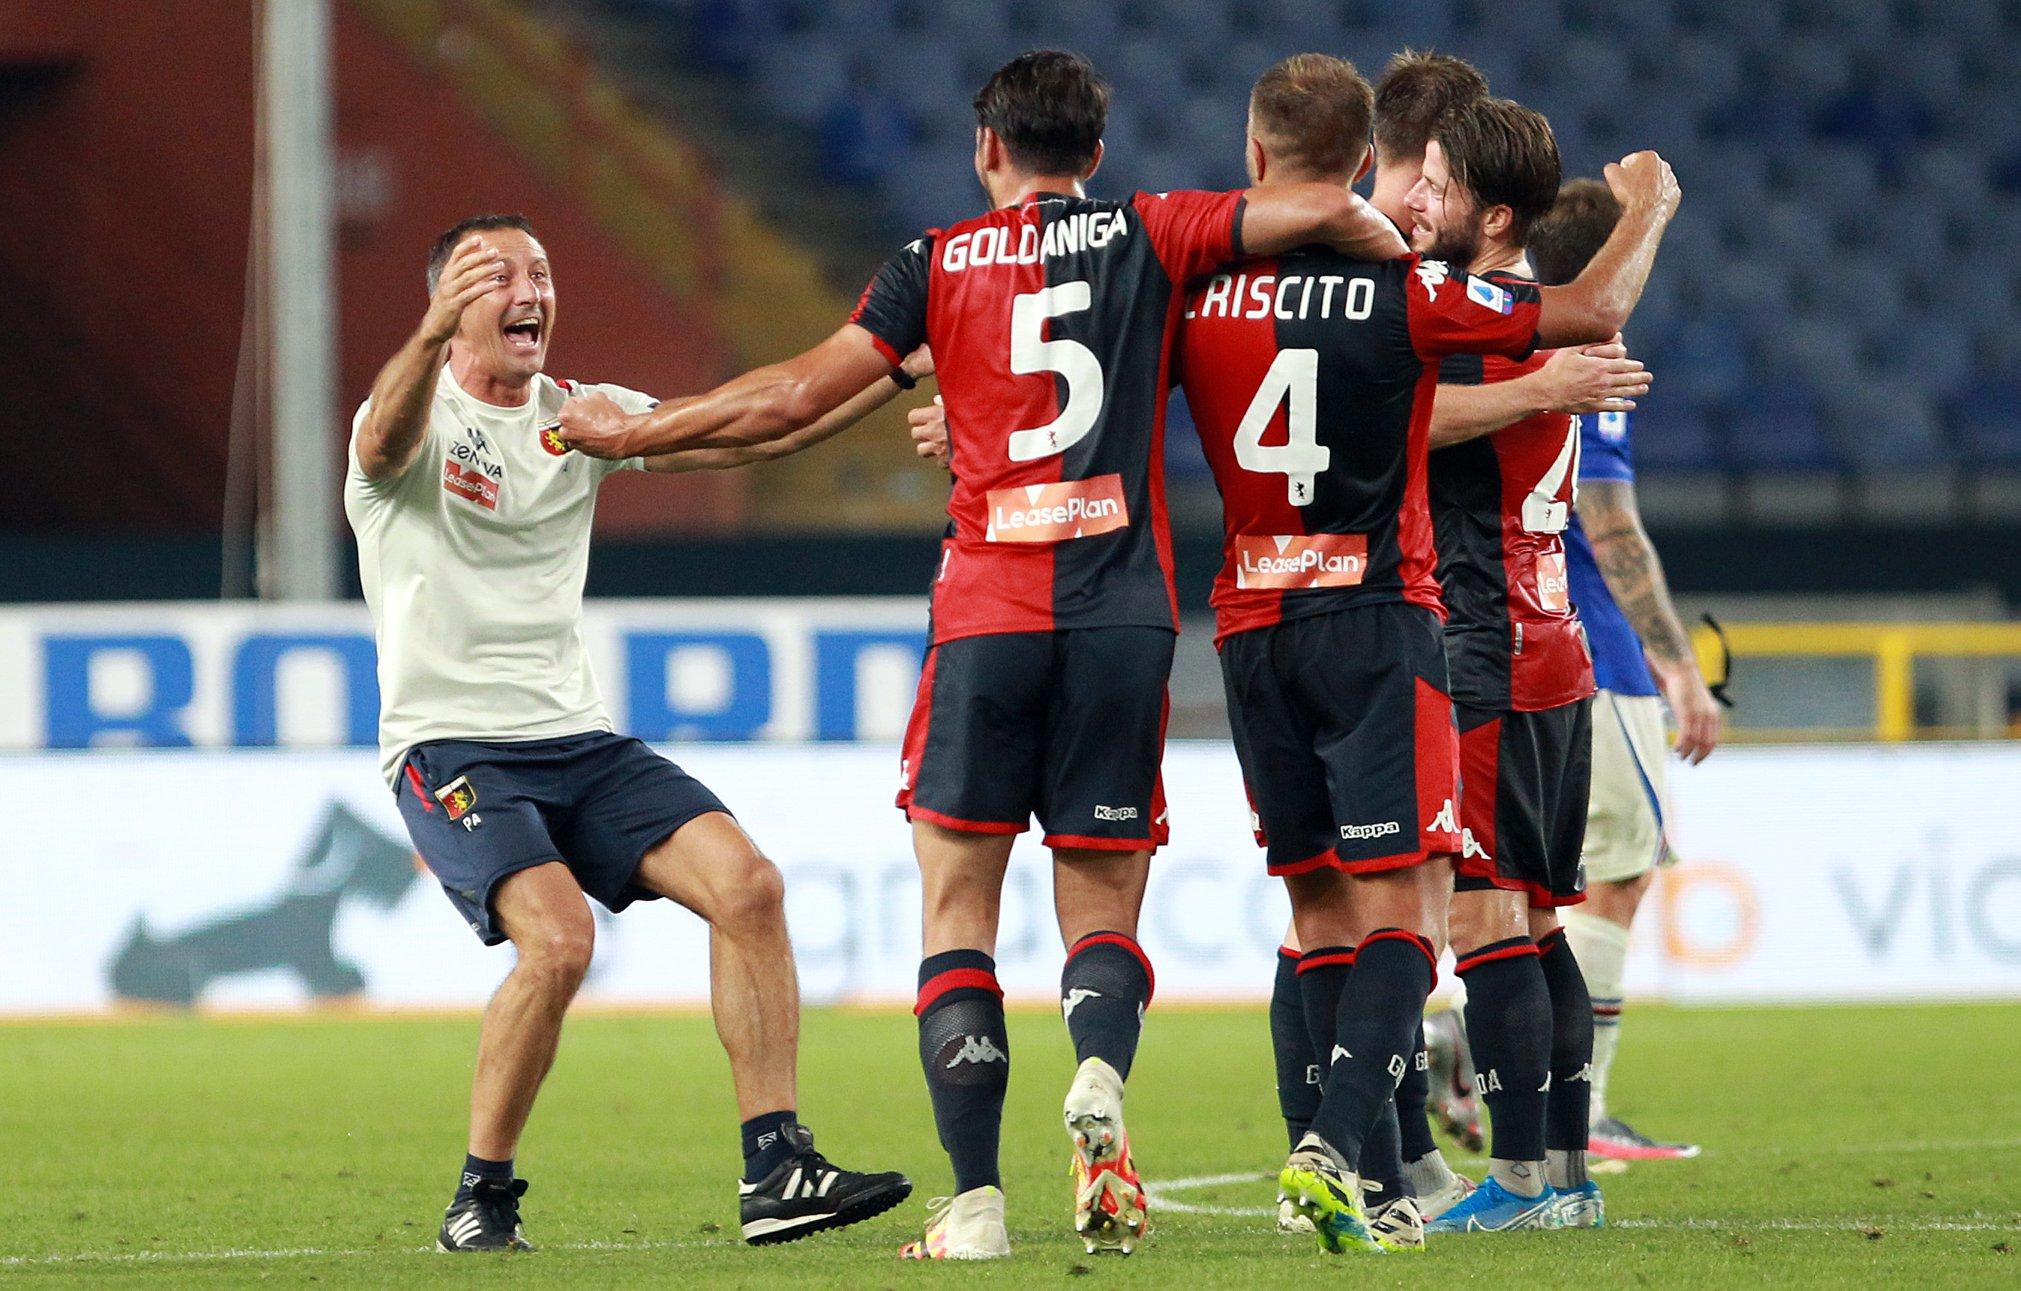 Criscito Goldaniga Genoa